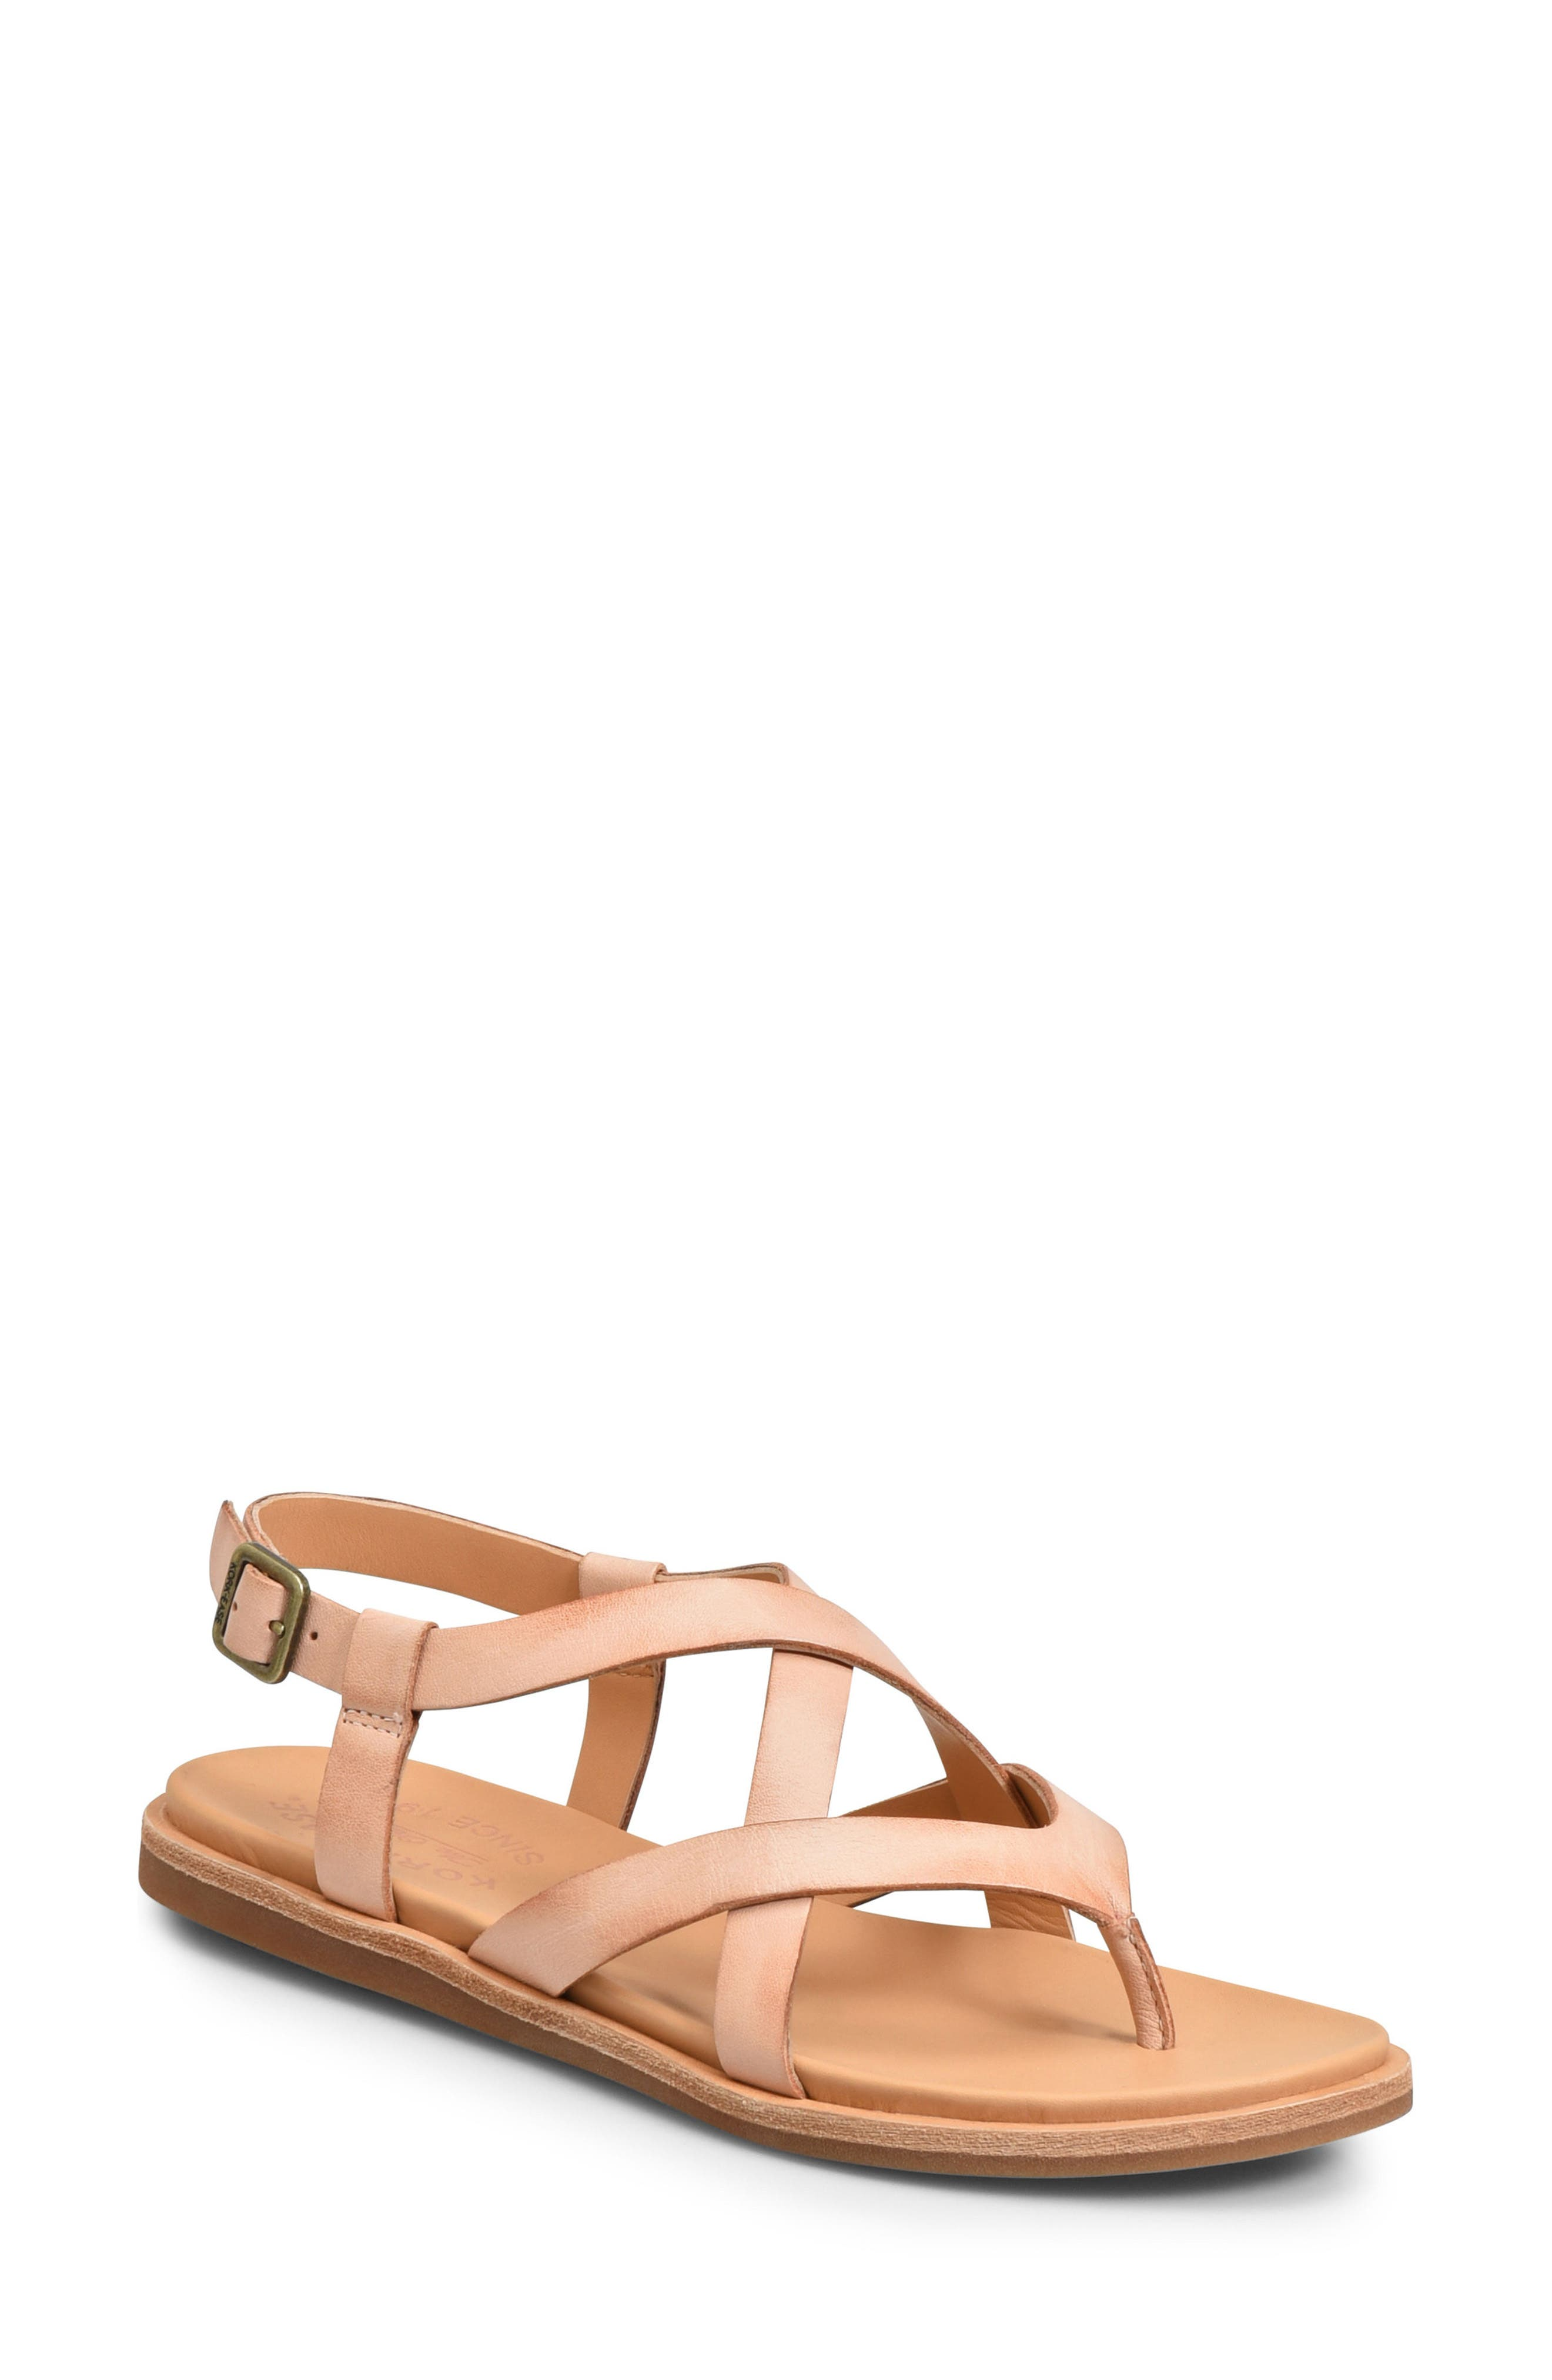 Yarbrough Sandal,                             Main thumbnail 1, color,                             Blush Leather